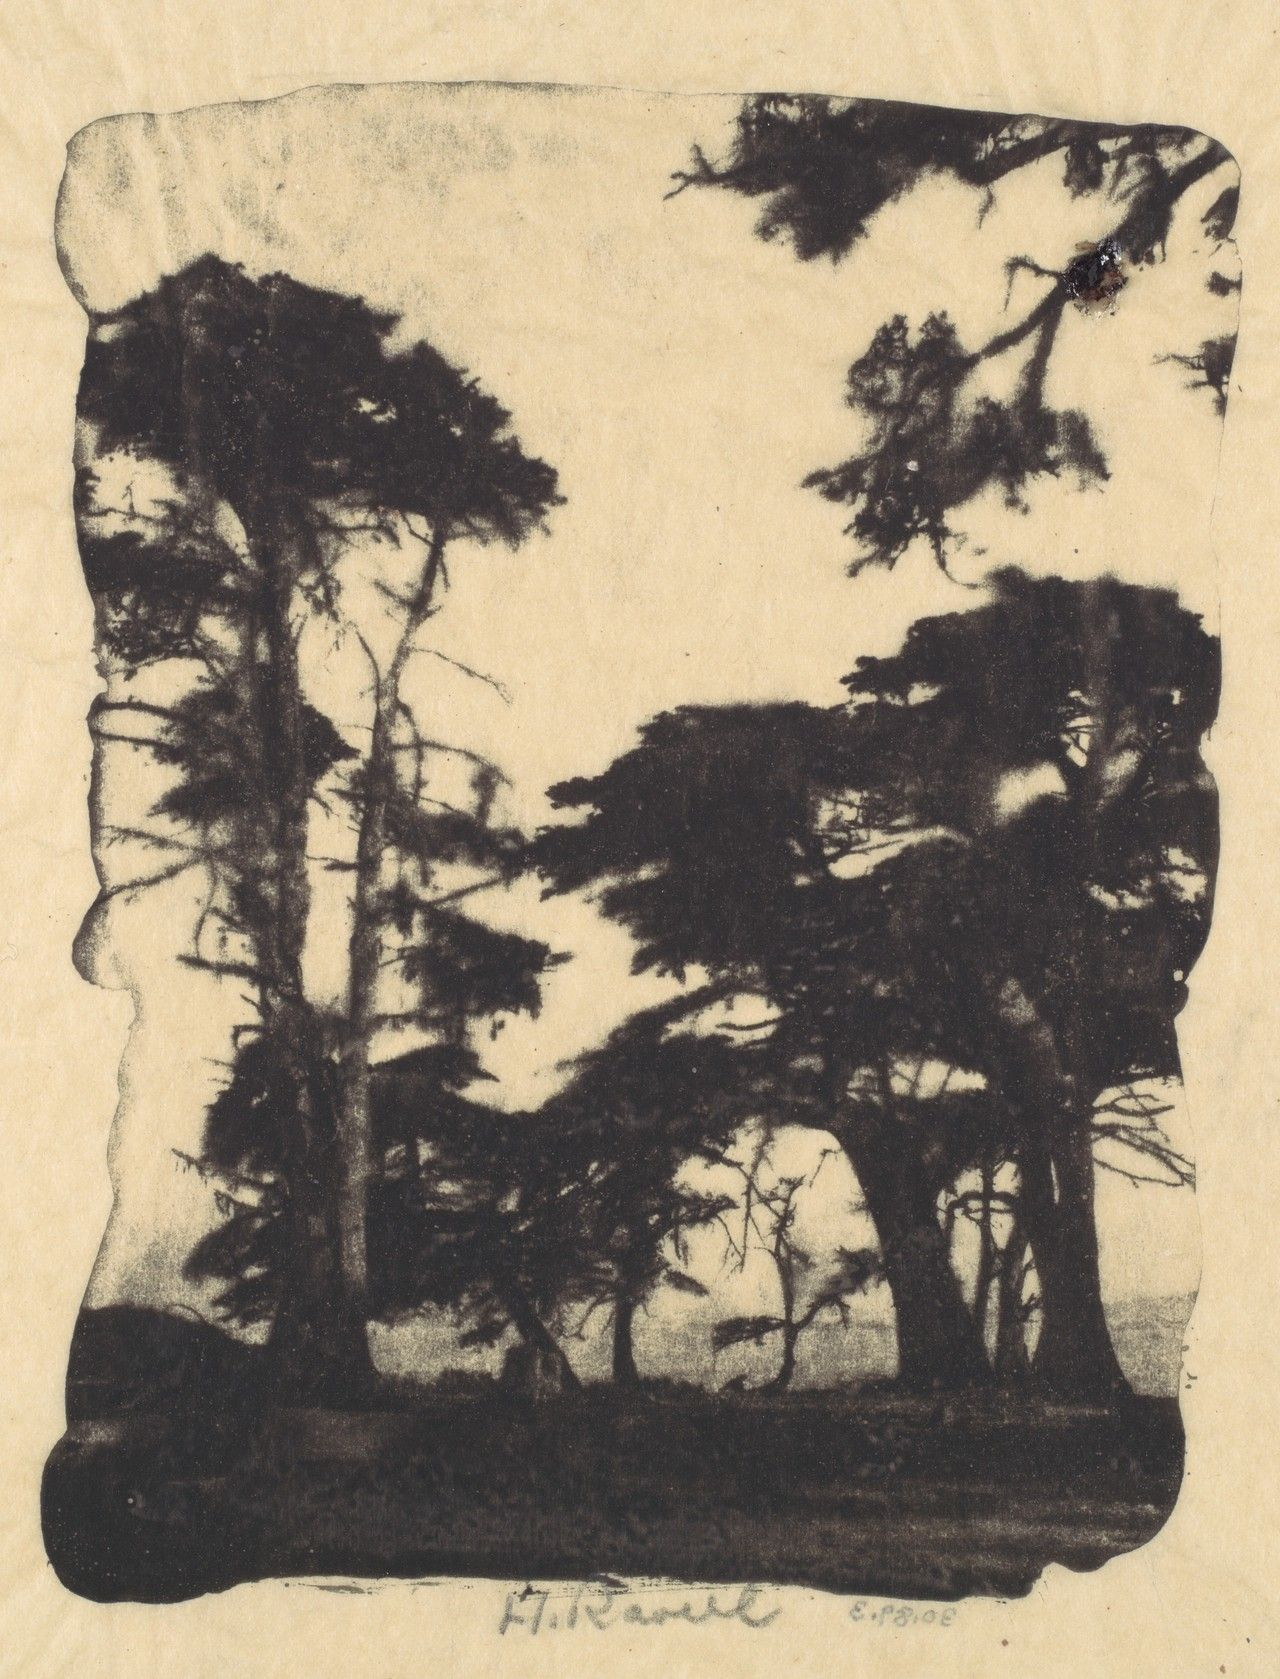 Cypress, Pebble Beach, California.Gum bichromate print,Henry Ravell, 1910s (via The Metropolitan Museum of Art)